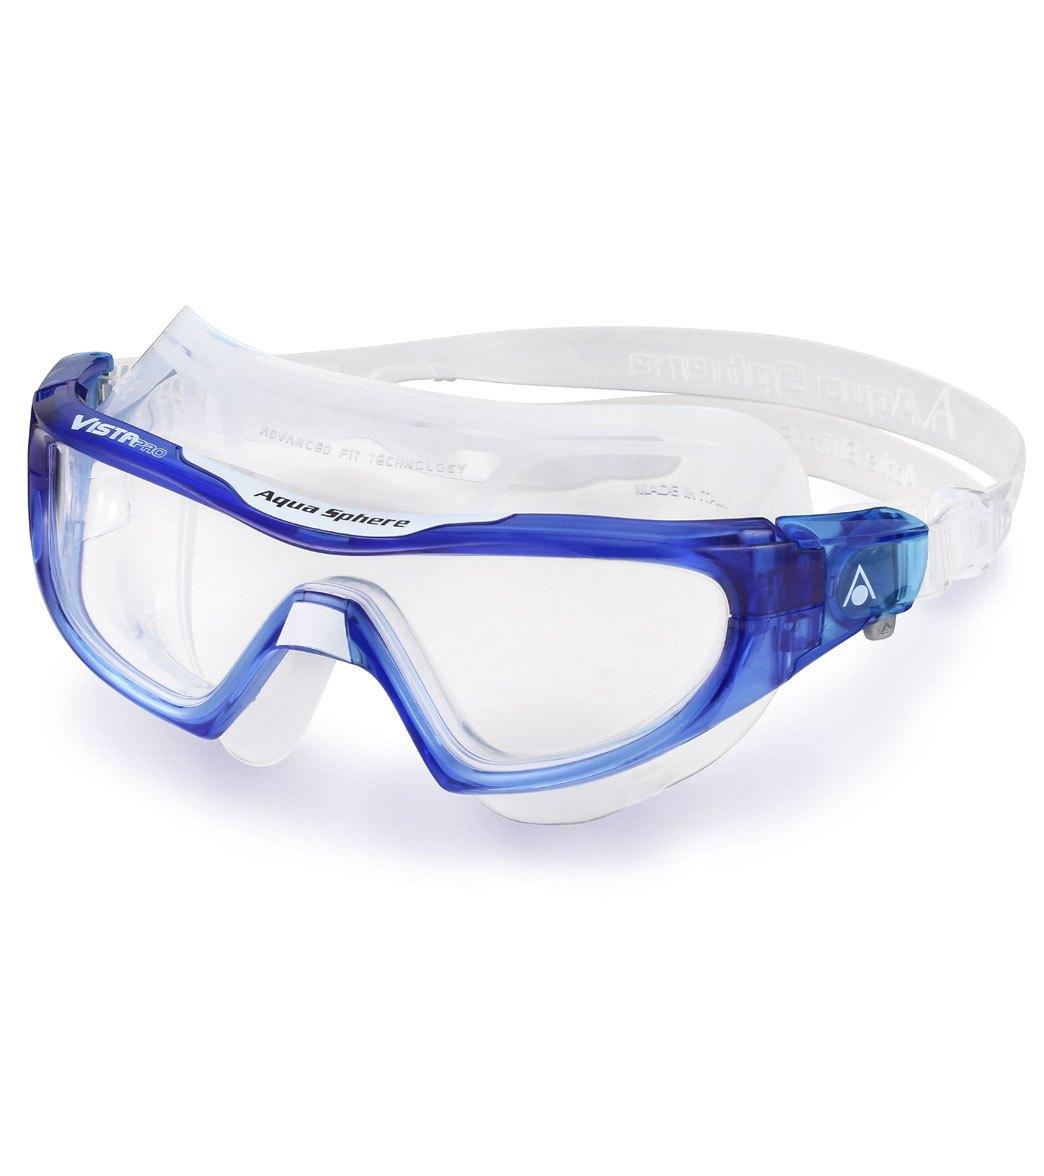 5bcd40b6603c Aqua Sphere Vista Pro Tri Goggle at SwimOutlet.com - Free Shipping